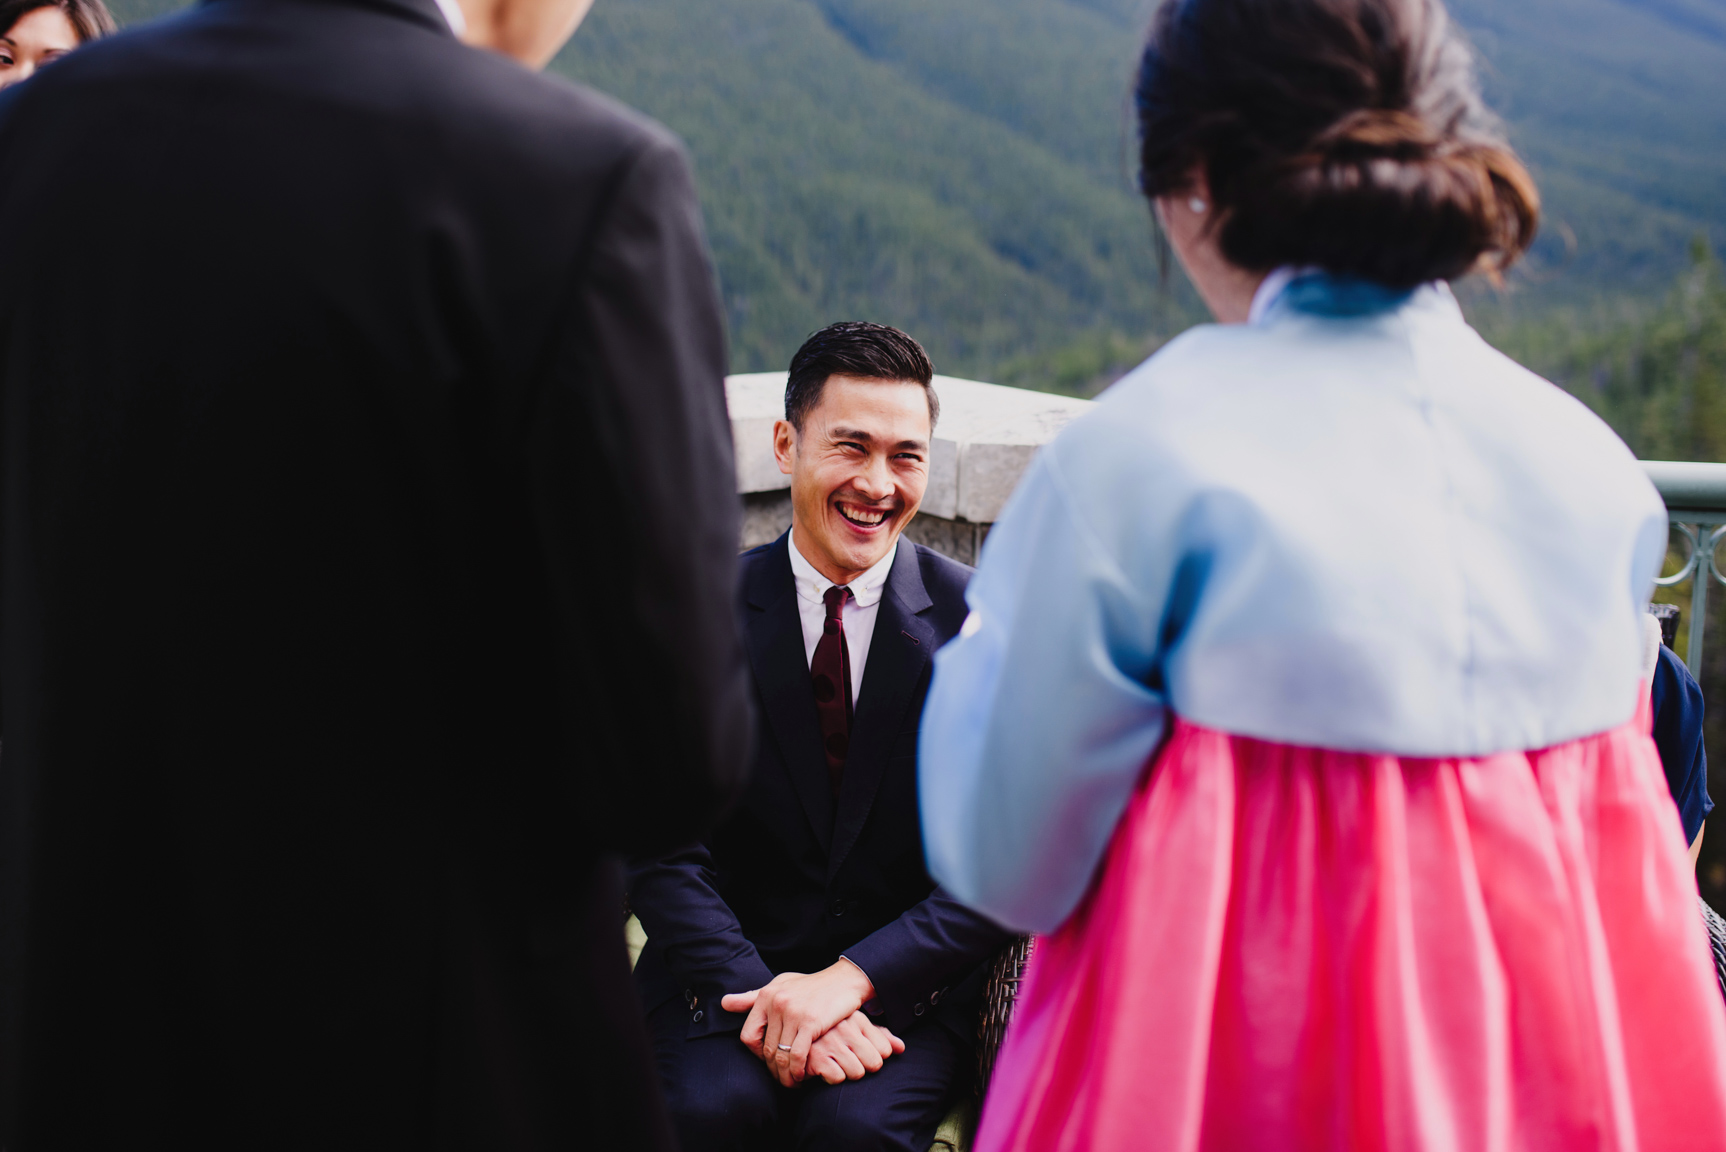 Banff-Wedding-Photography-MichaelChanPhotography22.JPG